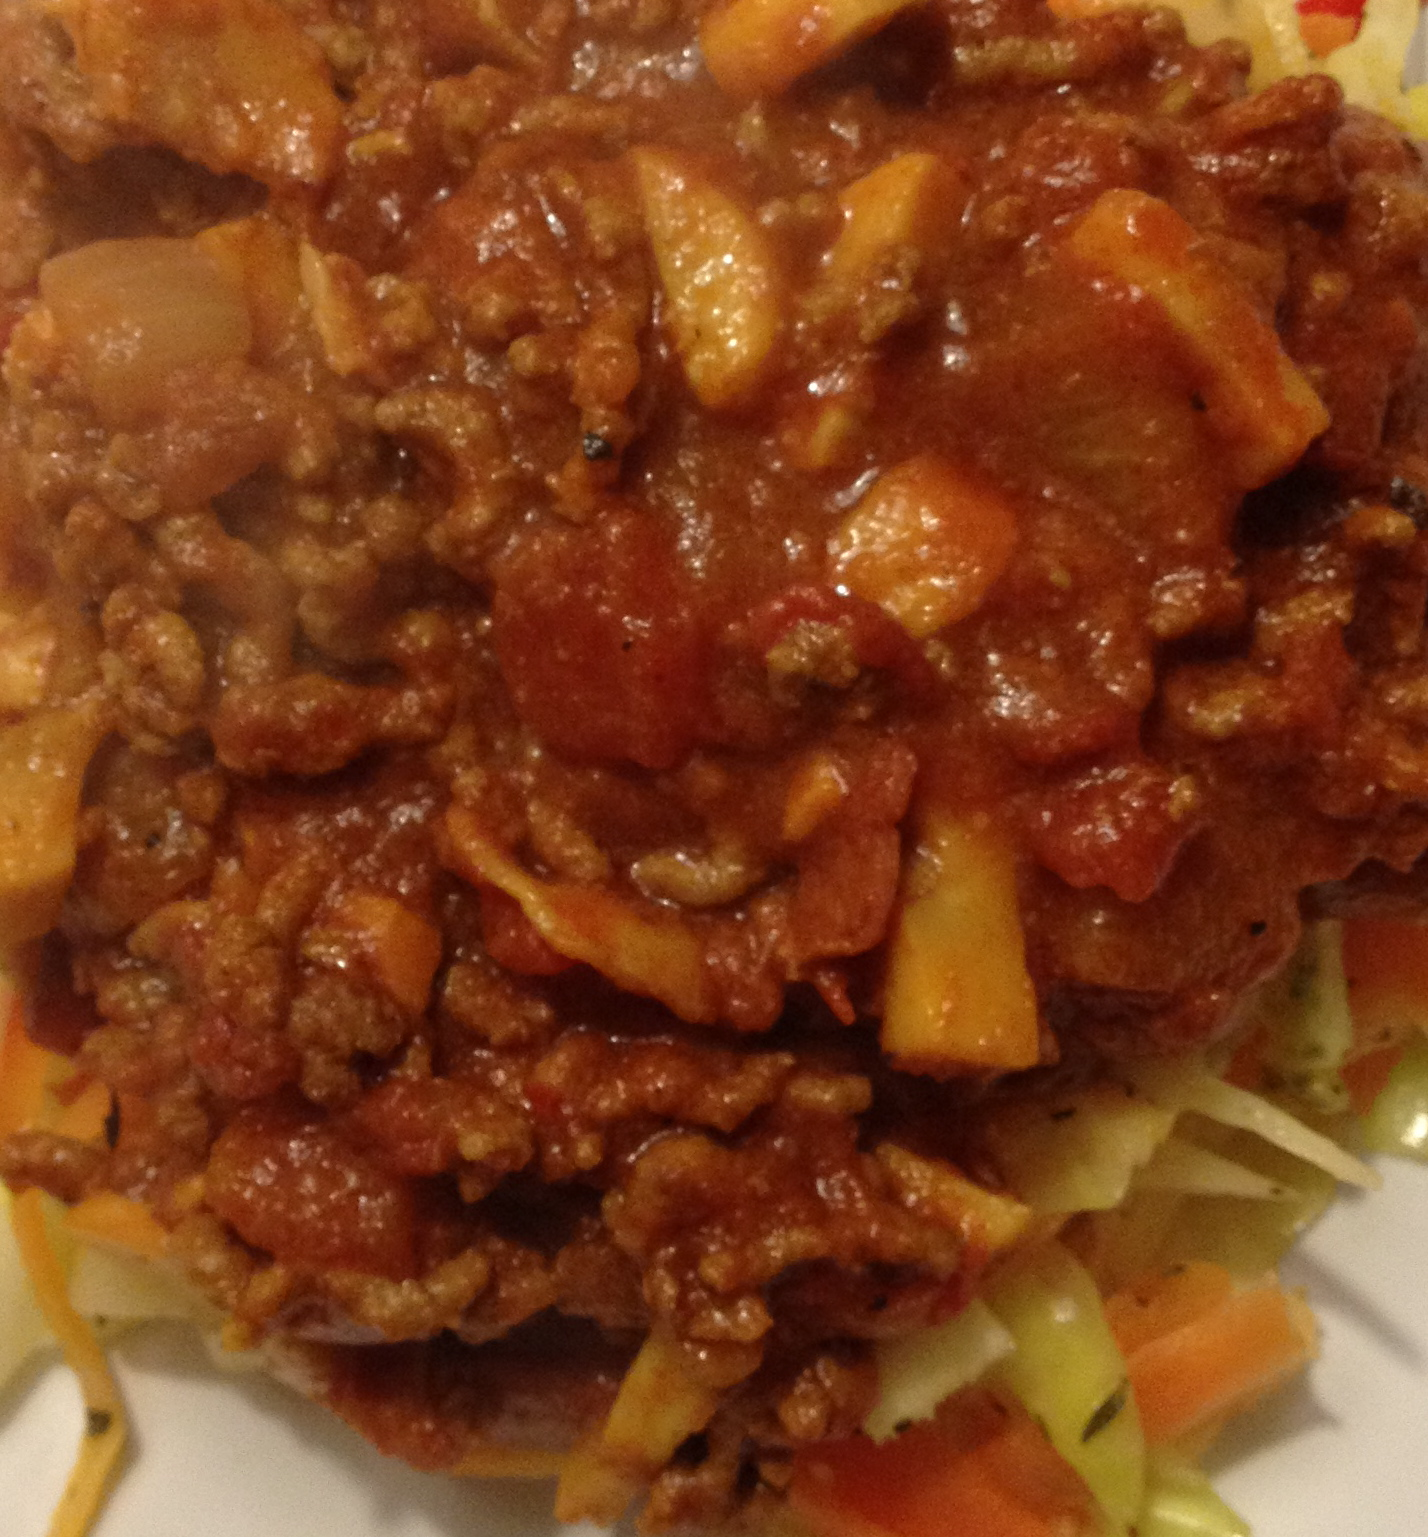 kødsovs med grøntsager